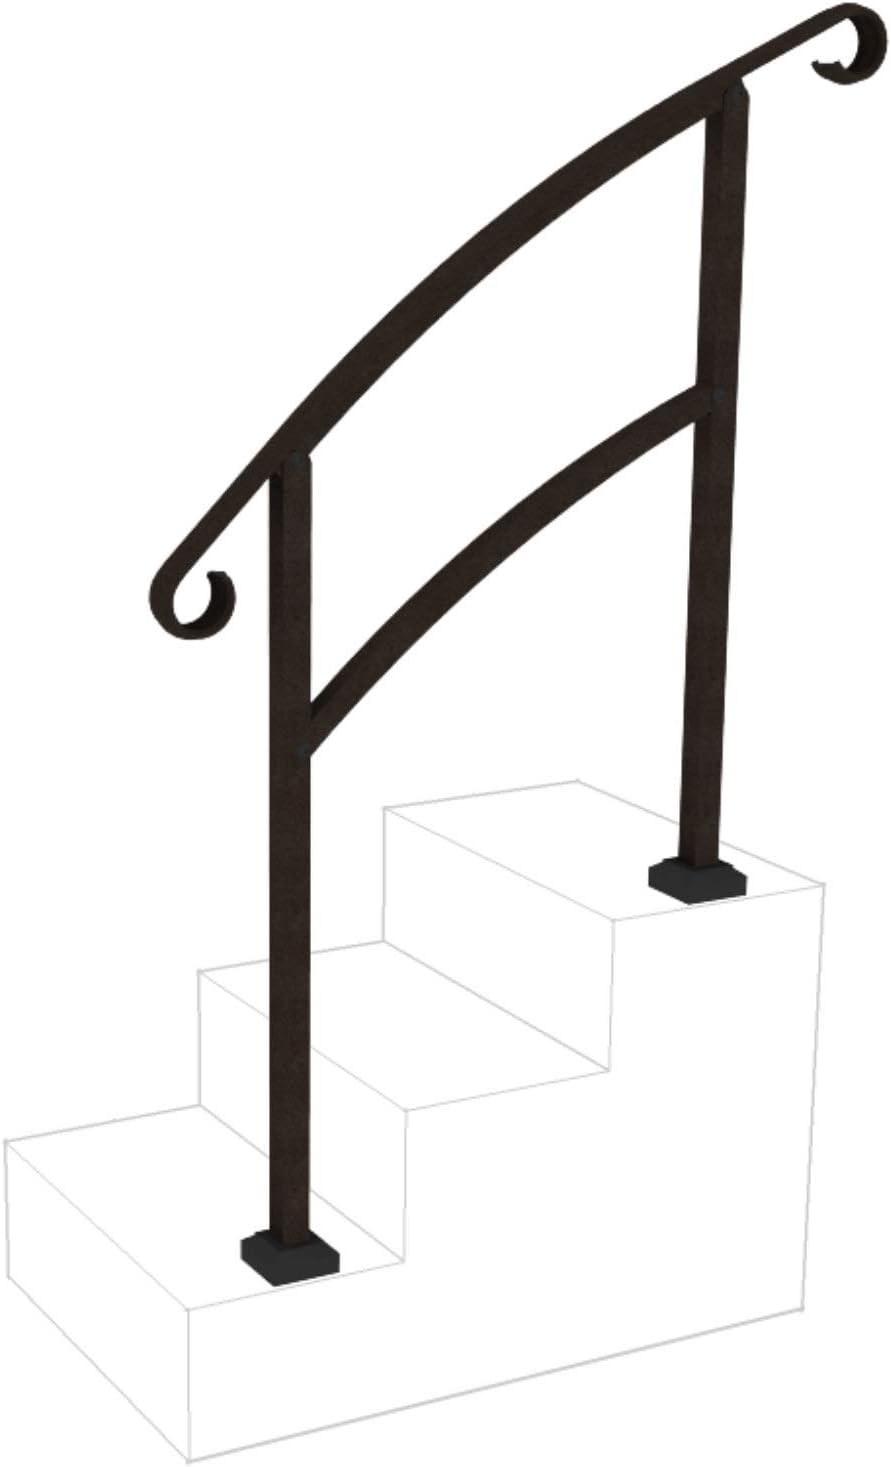 Instantrail 3 Step Adjustable Handrail Black Amazon Com   Exterior Handrails For Concrete Steps   Stair   Backyard   Cool   Side Entrance   Old House Porch